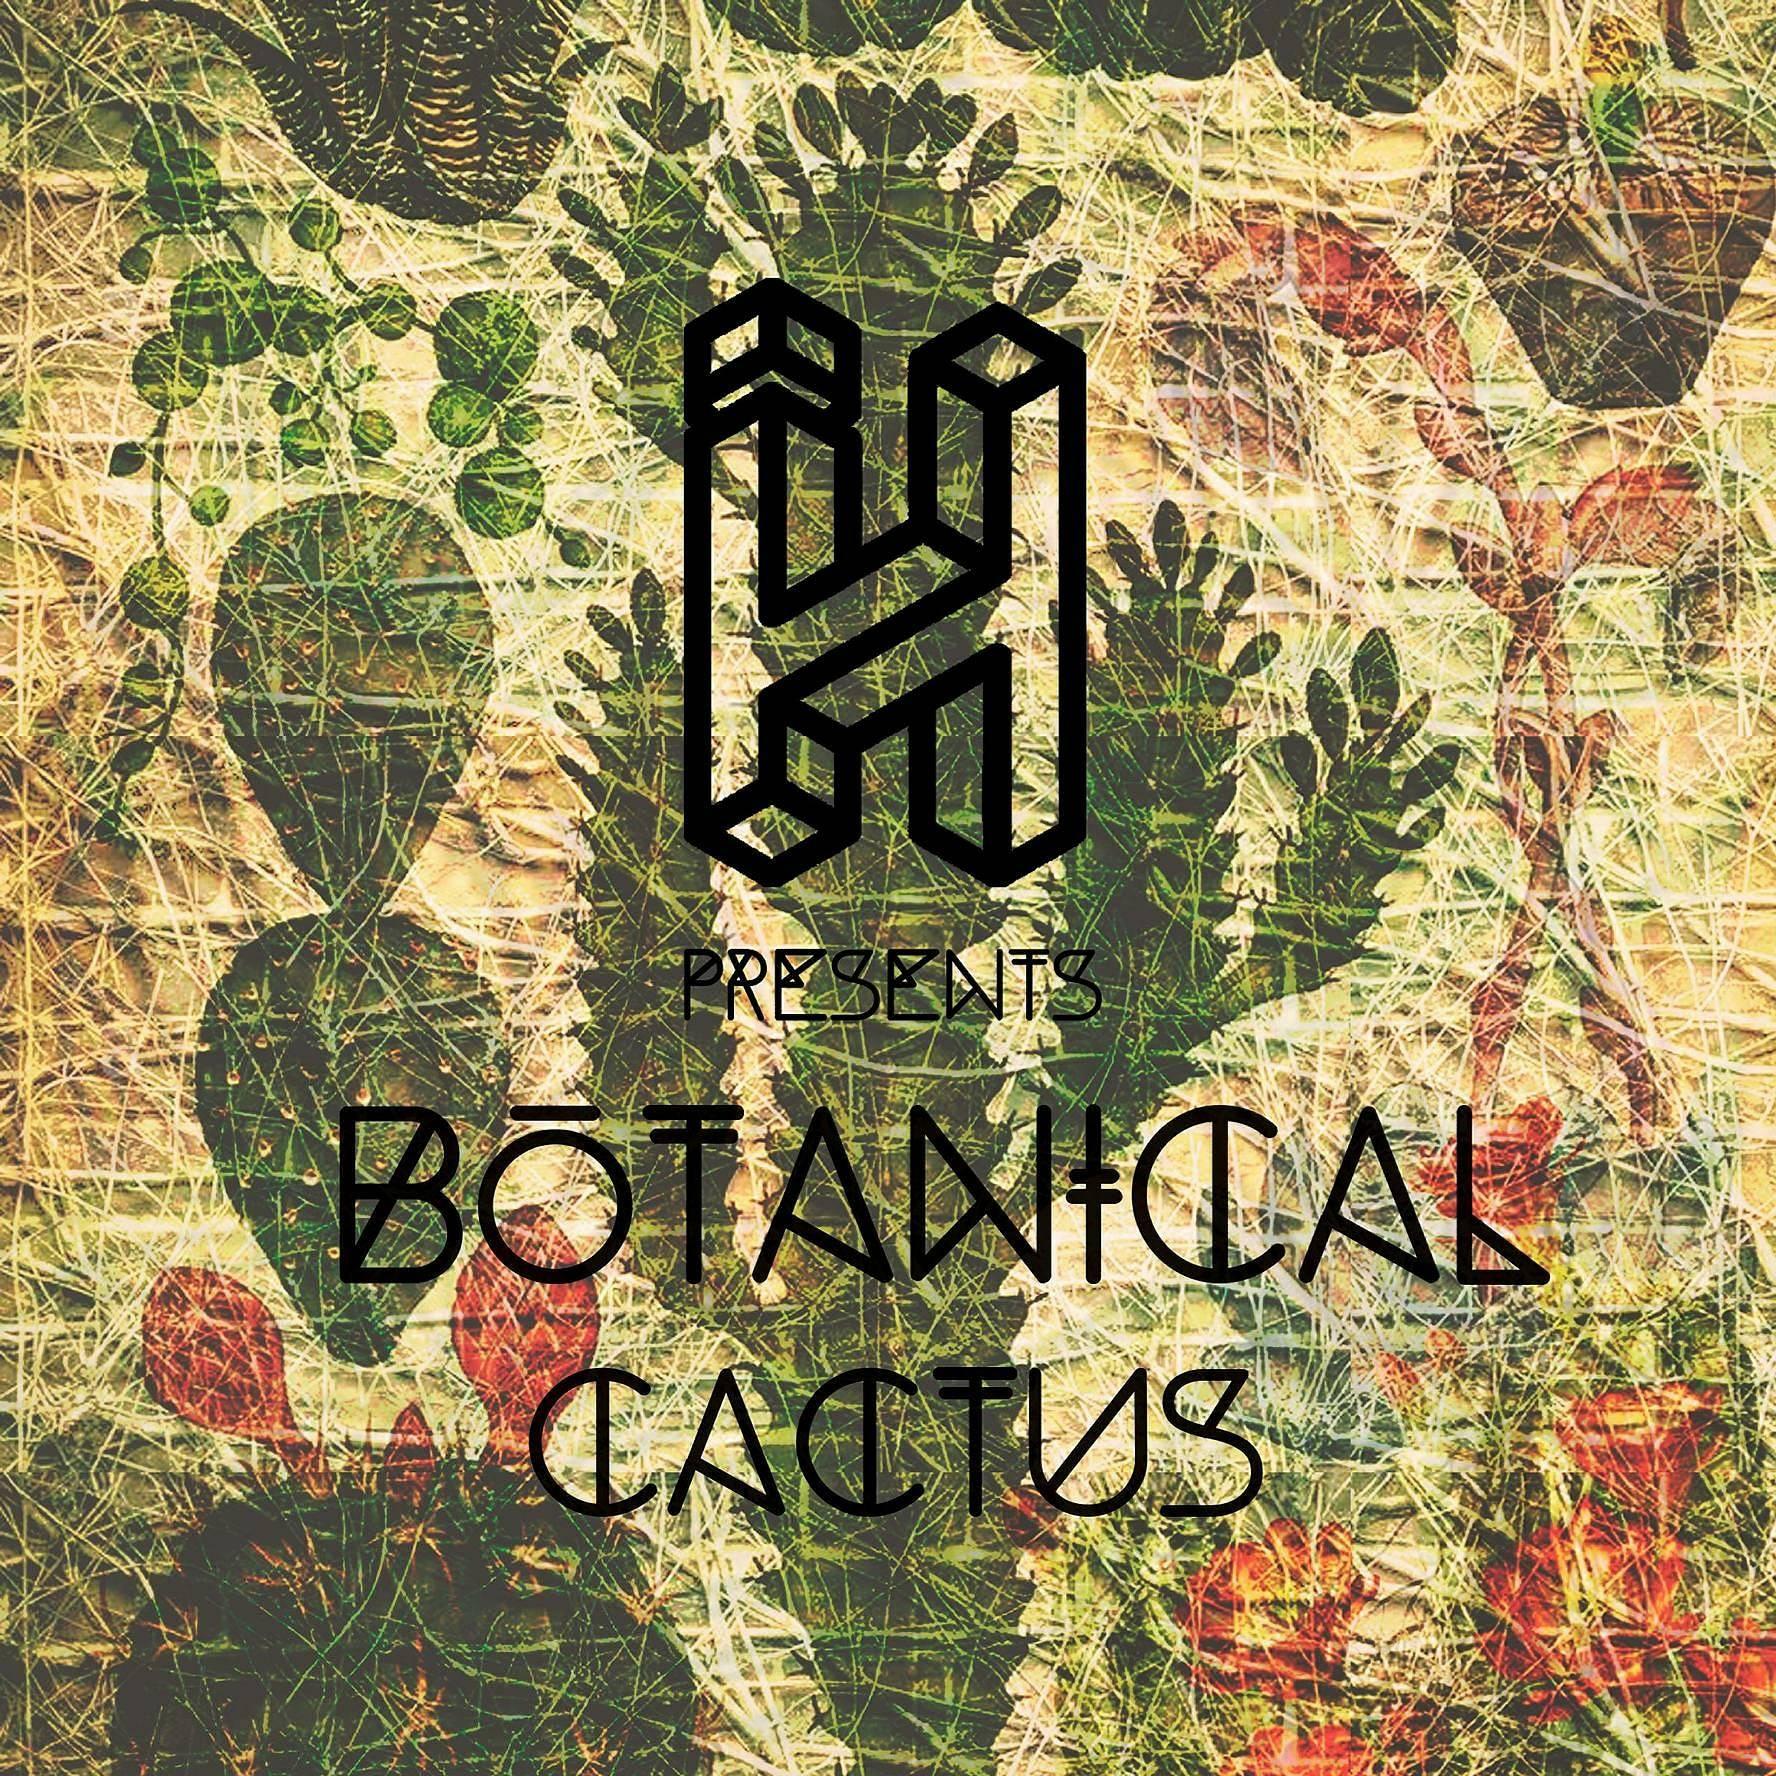 Cactus' Botanical's debut E.P